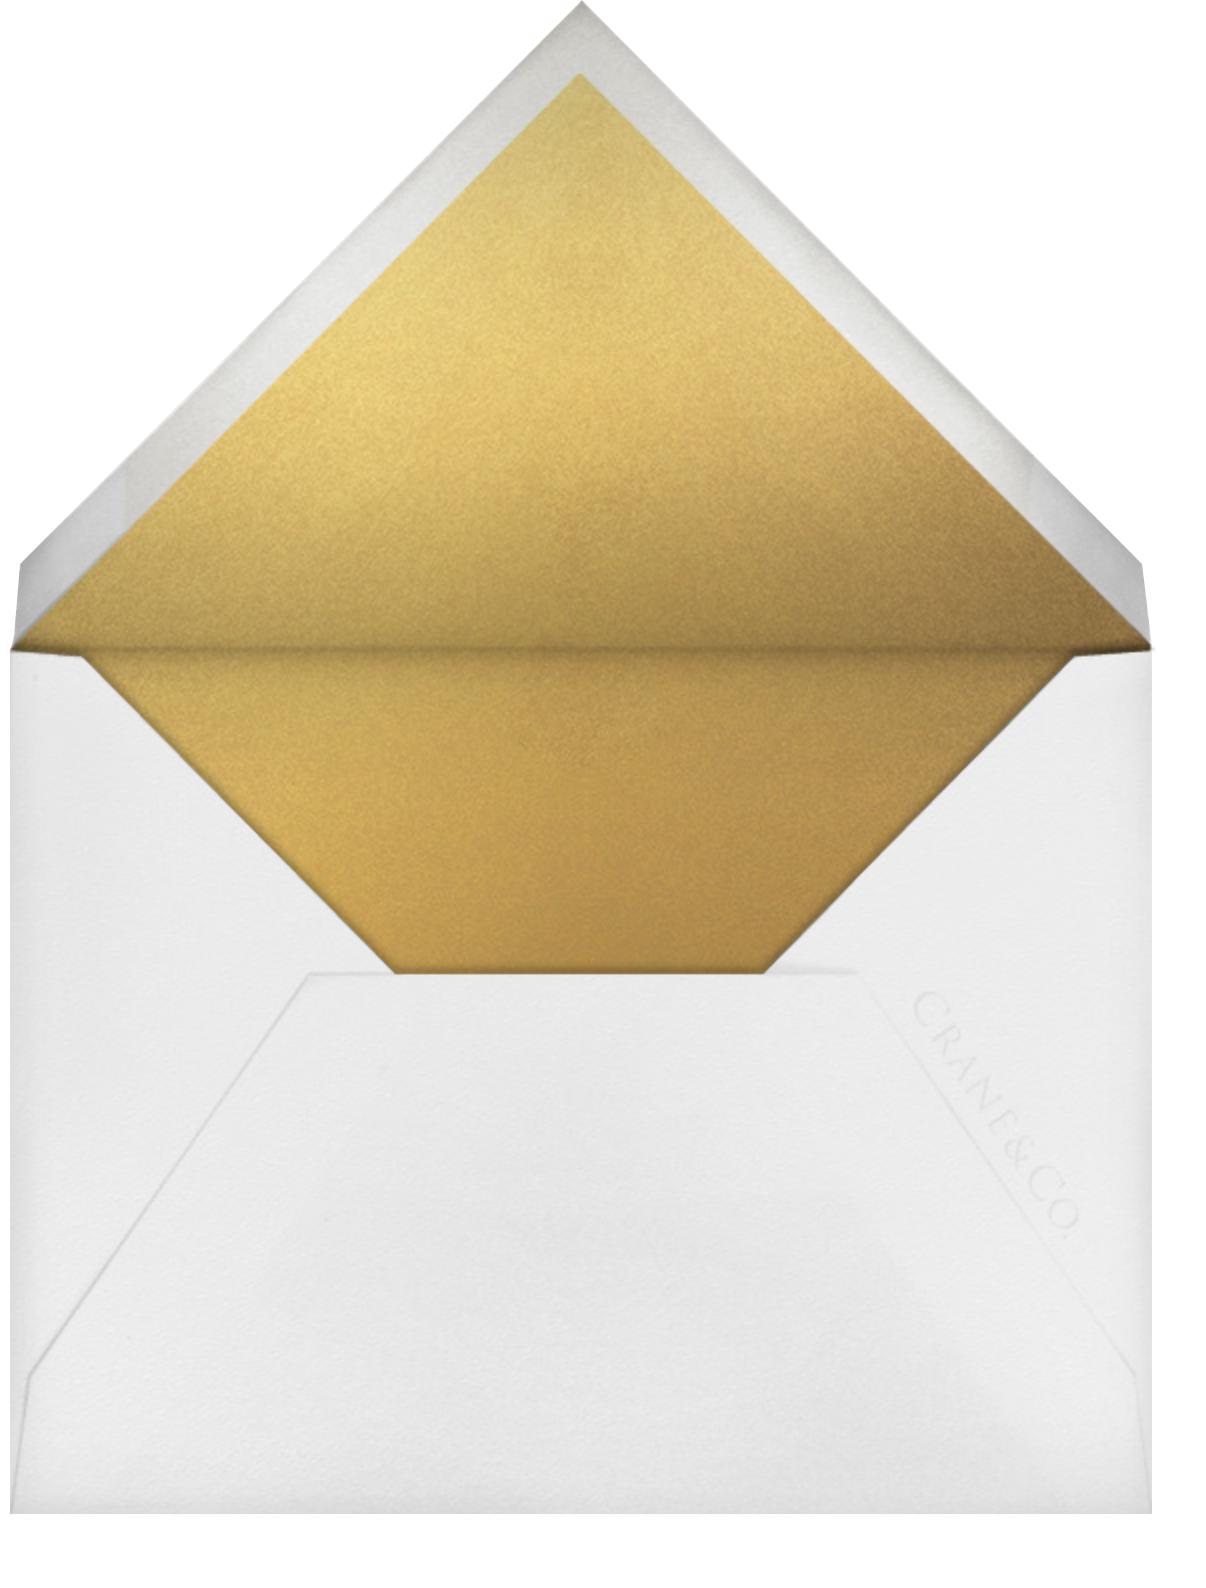 Palaestra (Invitation) - Crane & Co. - All - envelope back